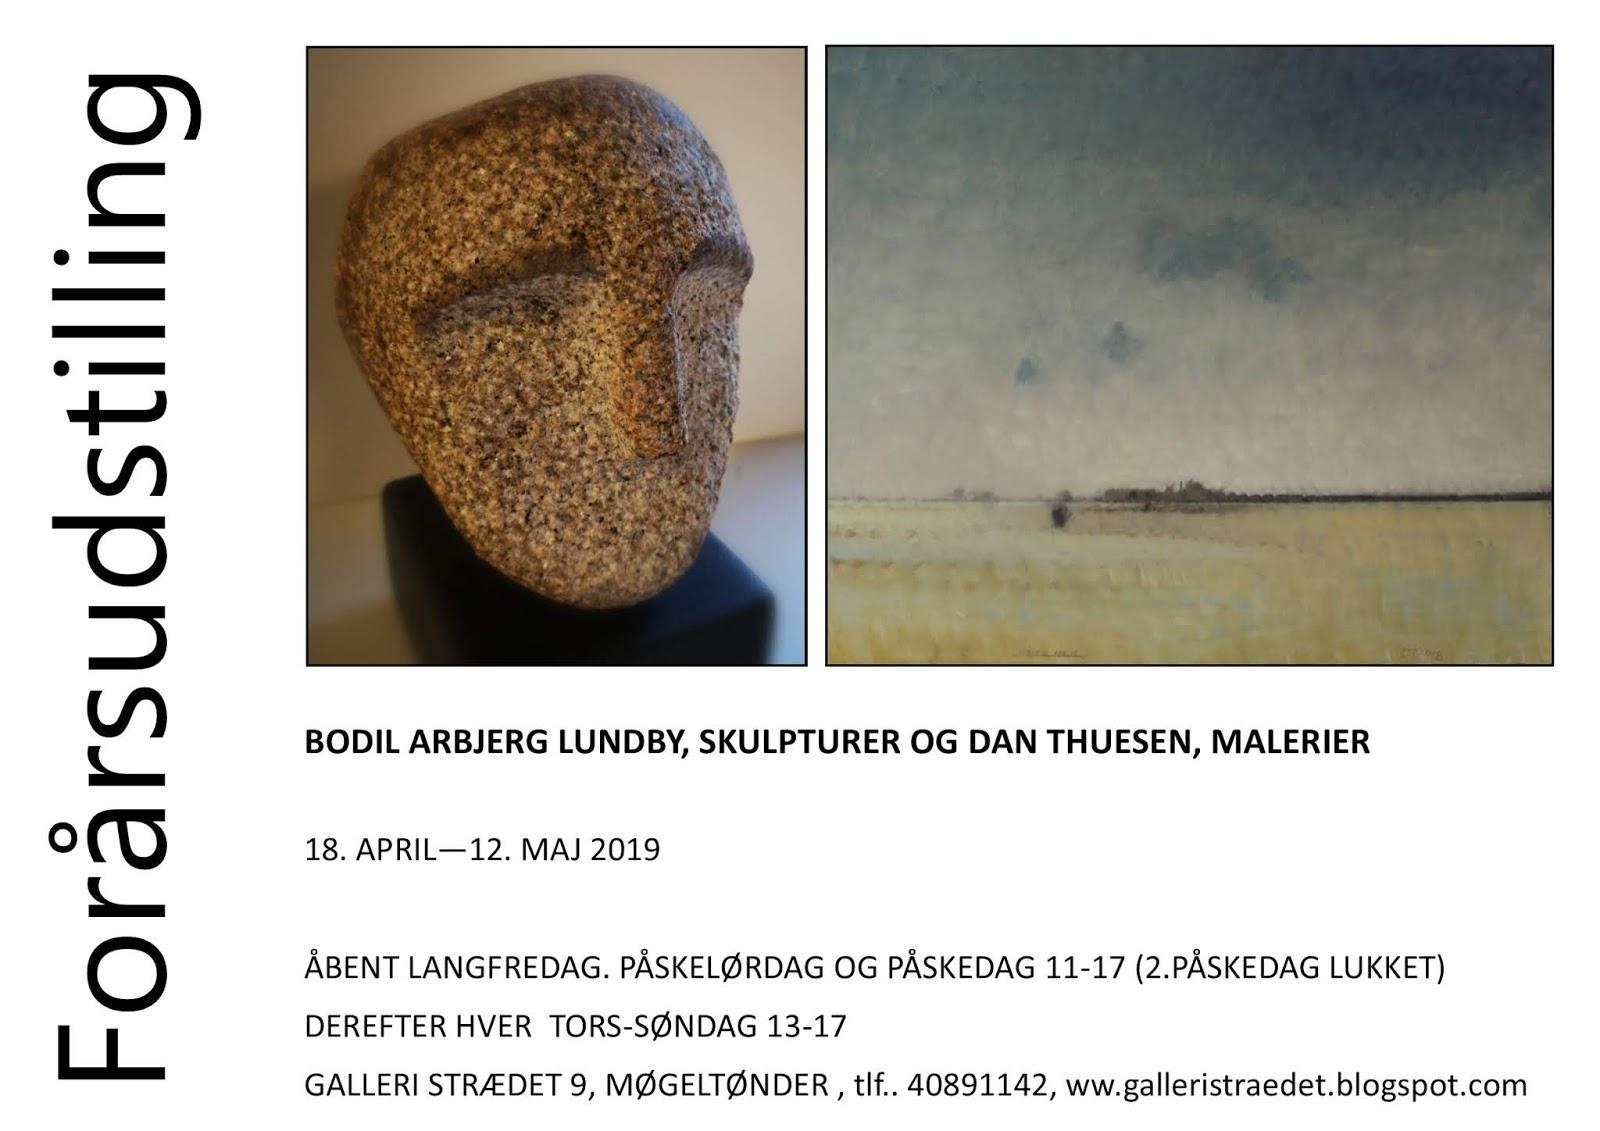 Alle malerier på siden er originale Hanne Adler Olsen billeder.